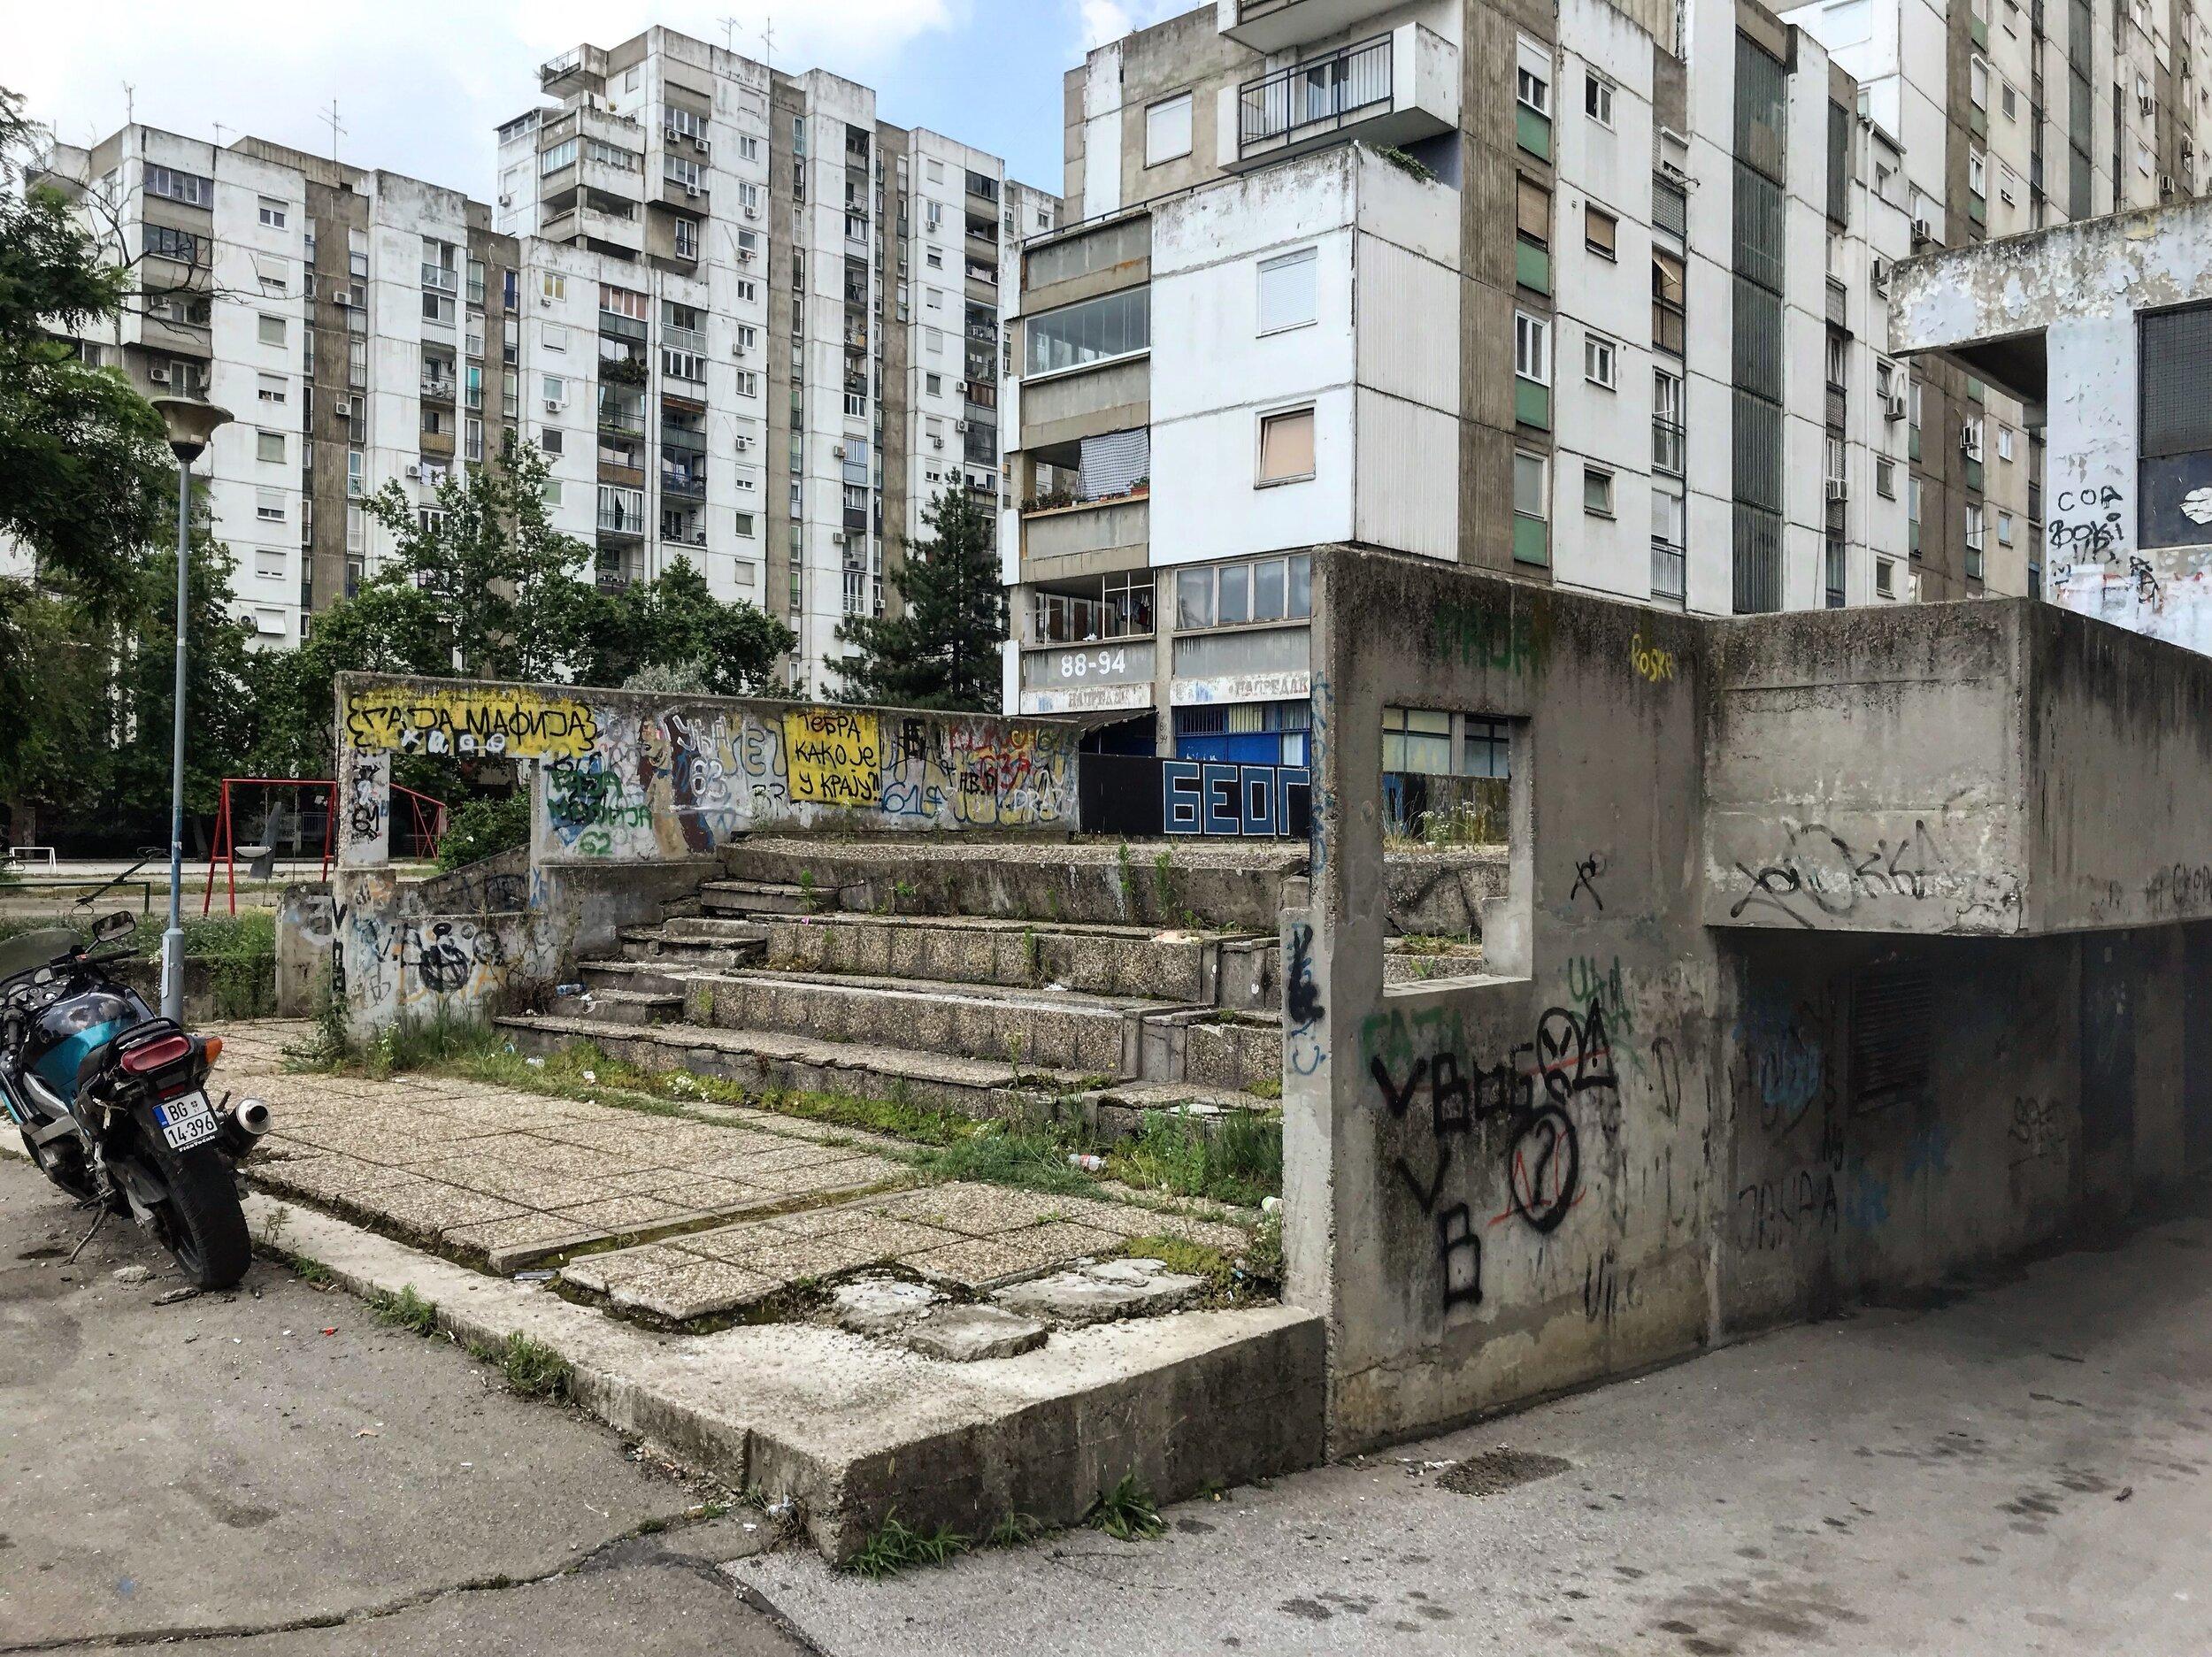 Figure 9. Bežanijski_04: Steps with cast concrete side walls in Block 62, Bežanijski blokovi, 2019. Photograph by Michael R. Allen